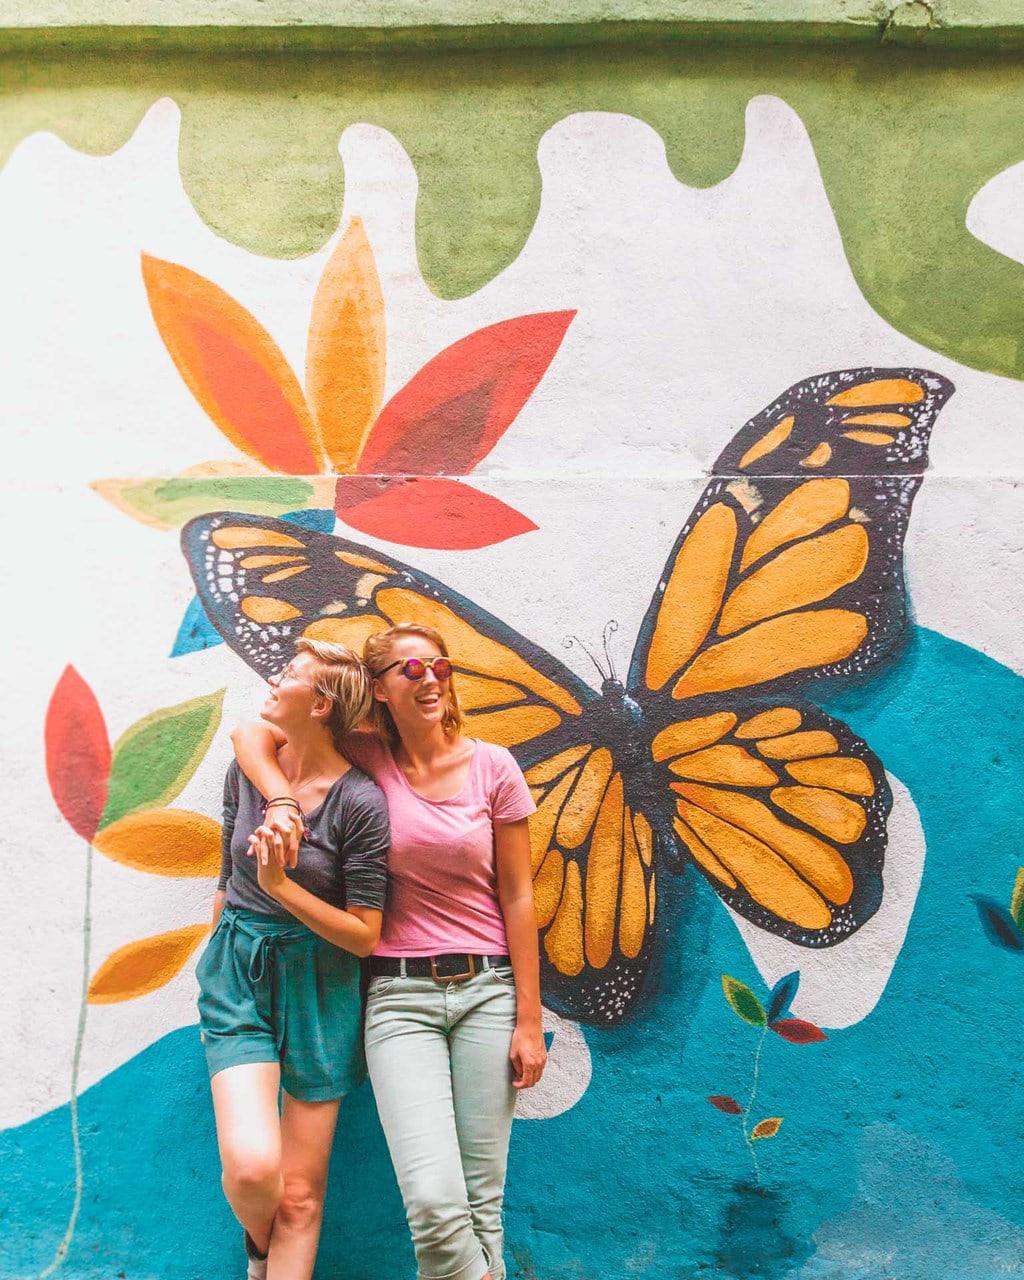 Bukit Bintang Street Art Butterfly, Kuala Lumpur